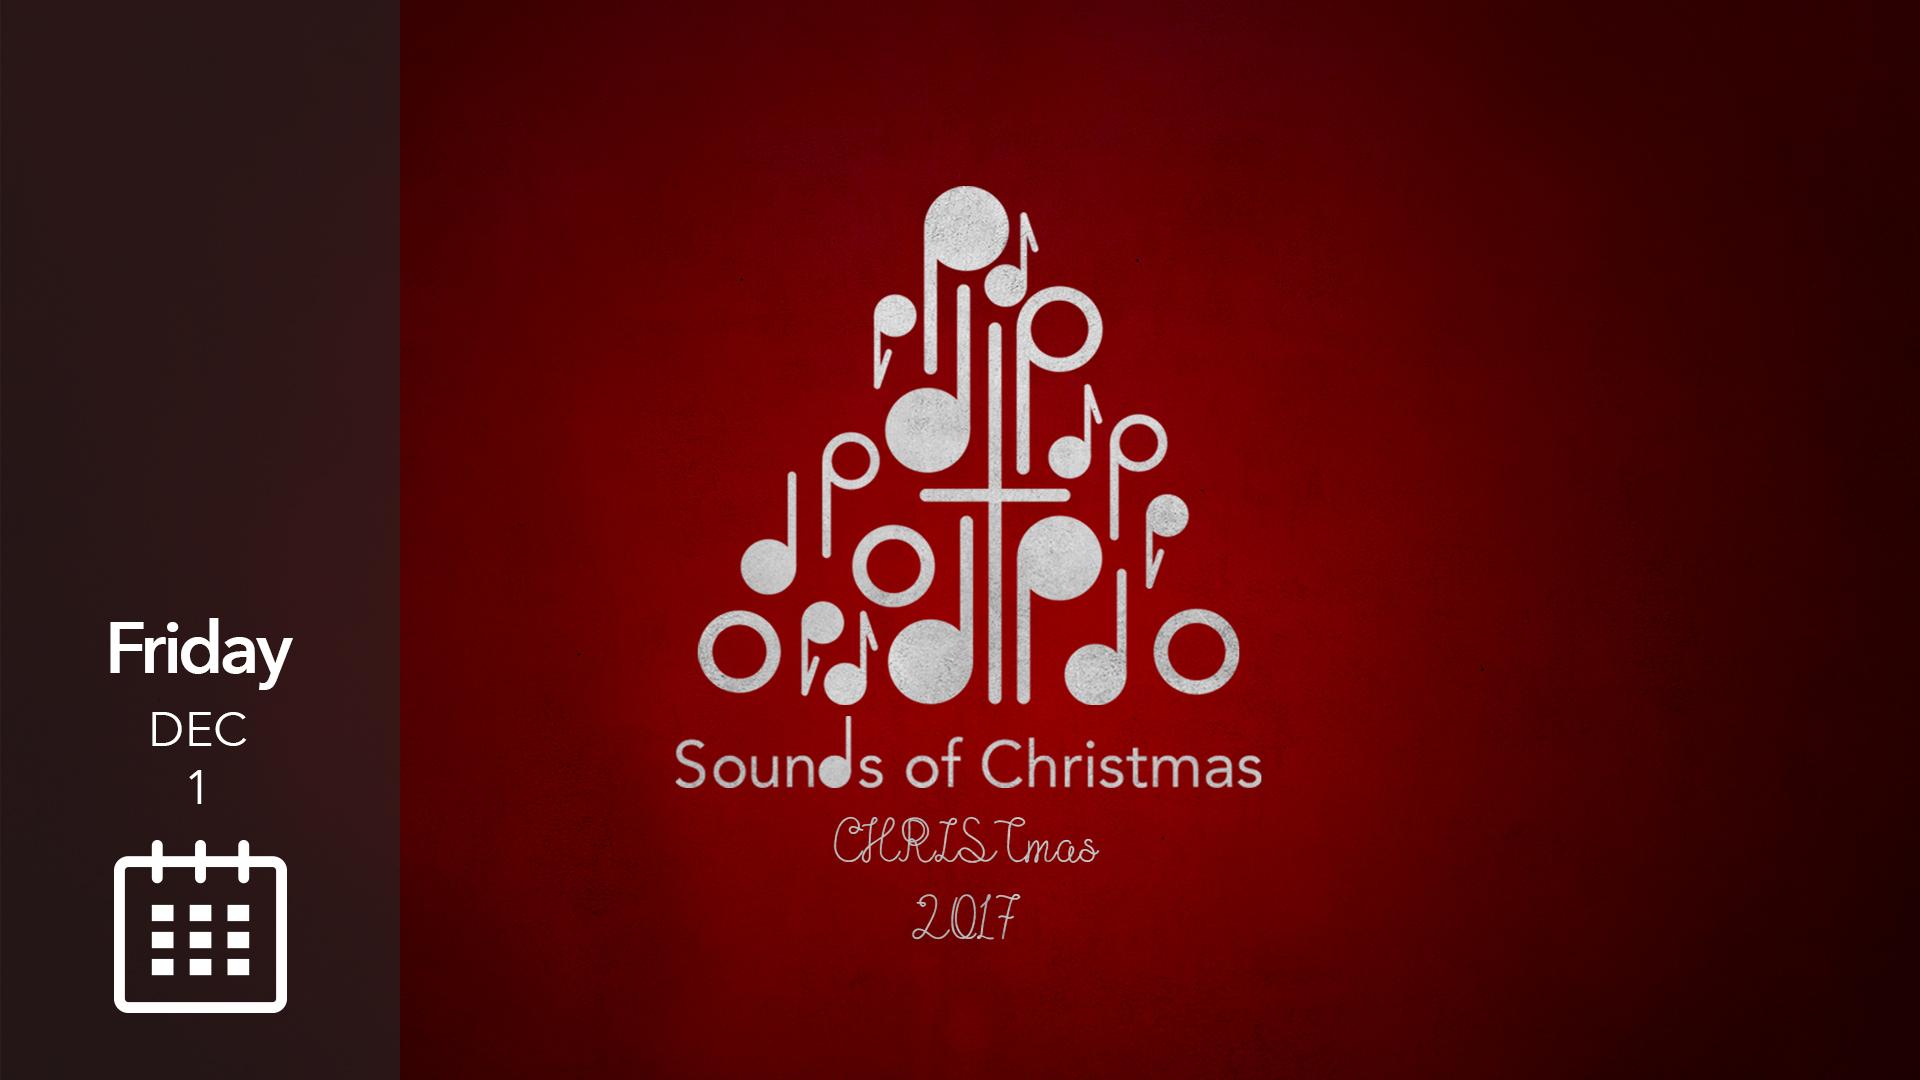 CHRISTmas-event.jpg